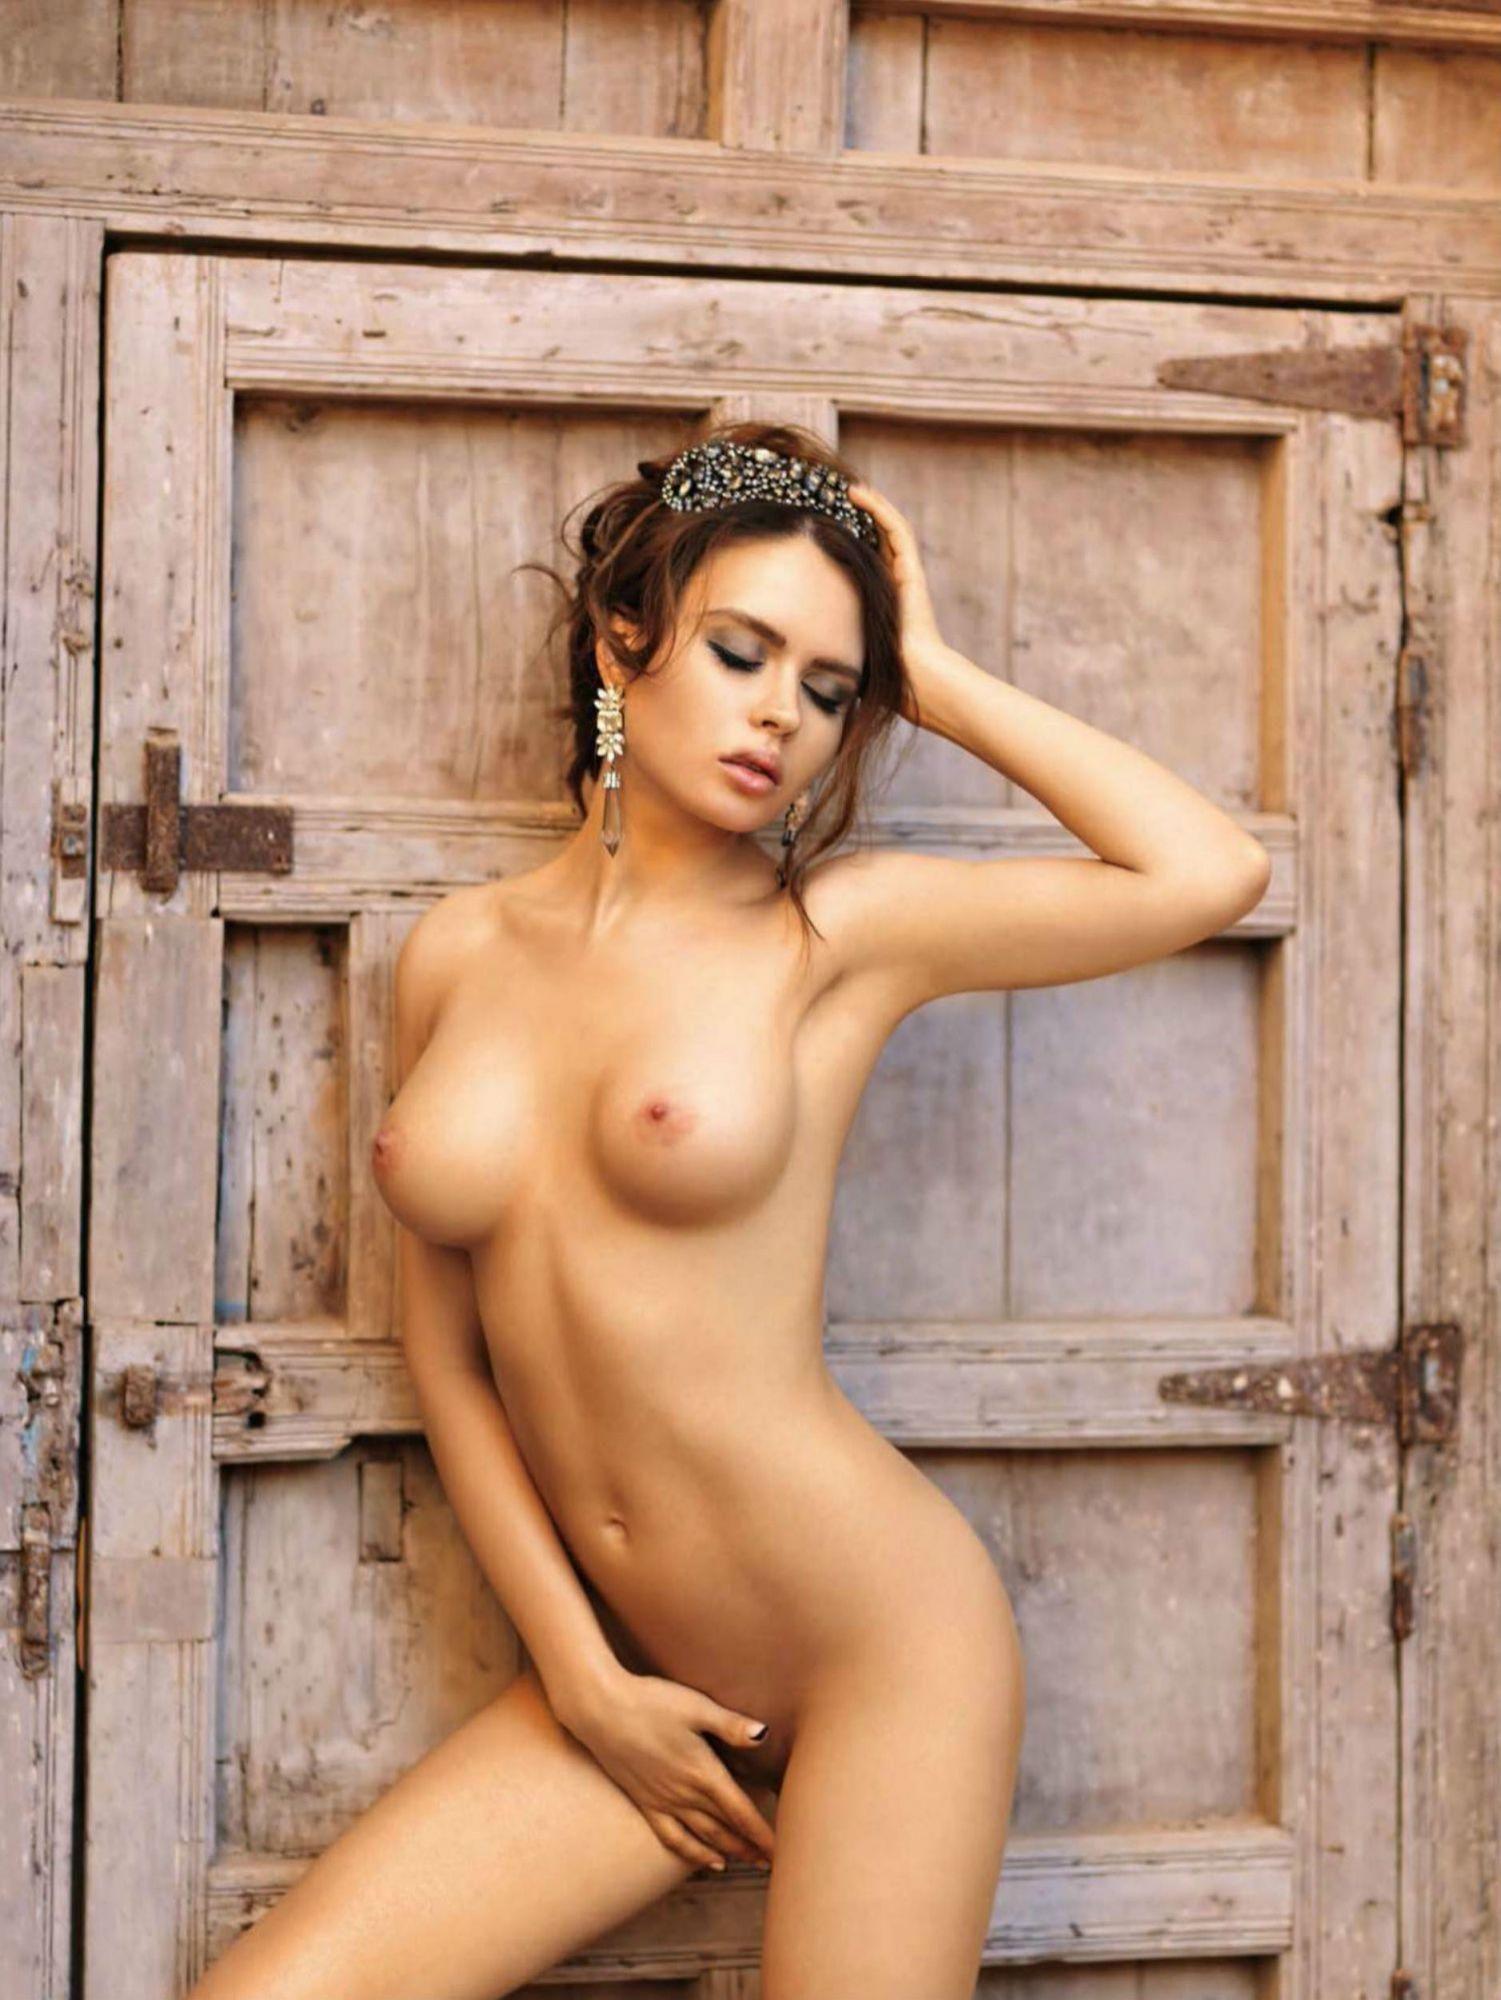 All Slovenia nude girls photos